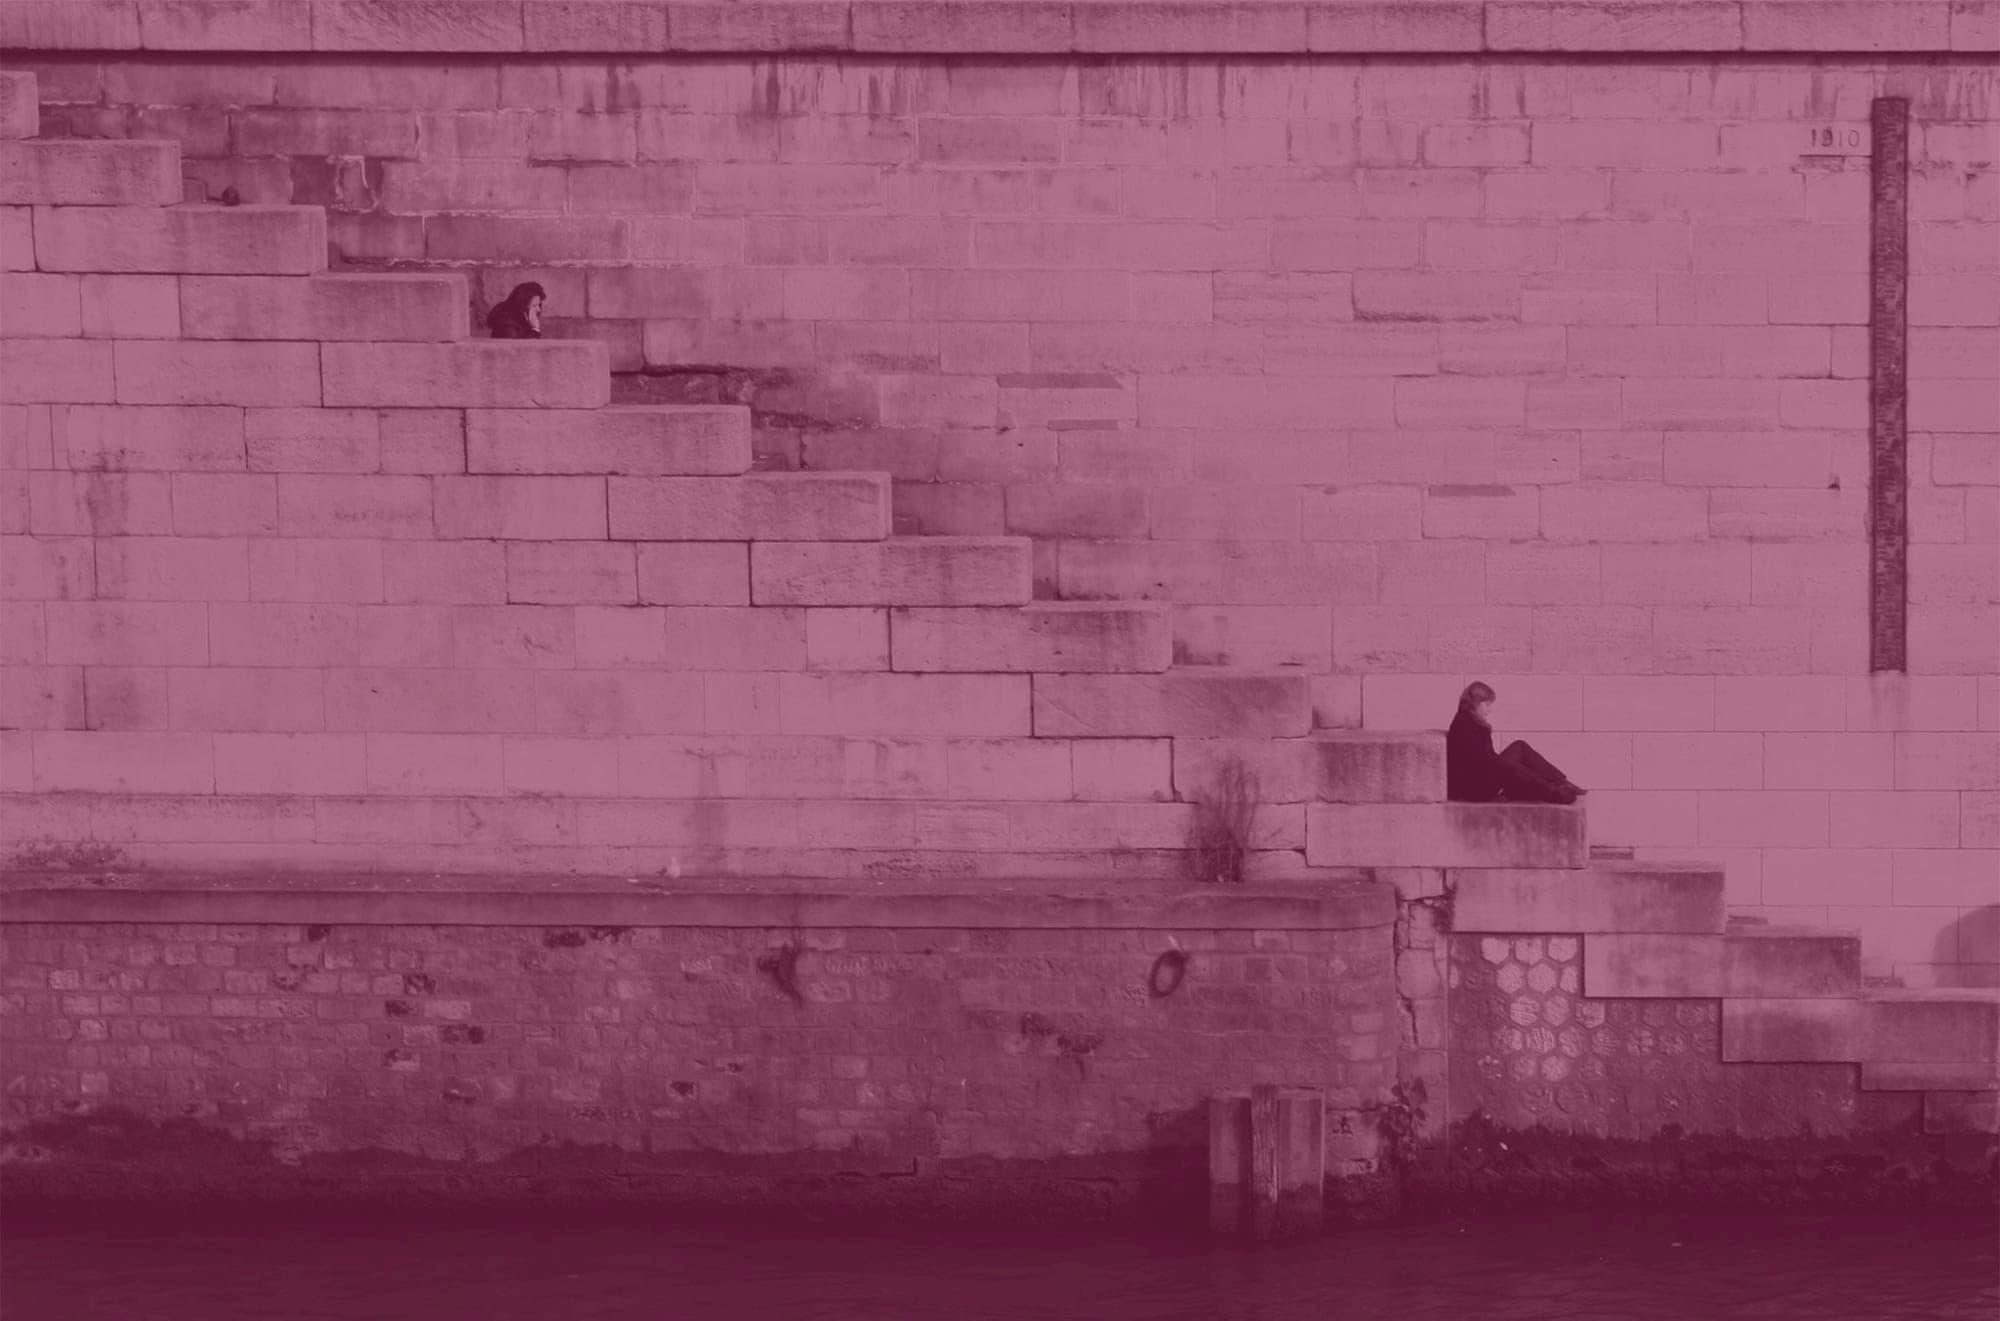 4 ways to combat entrepreneurial loneliness